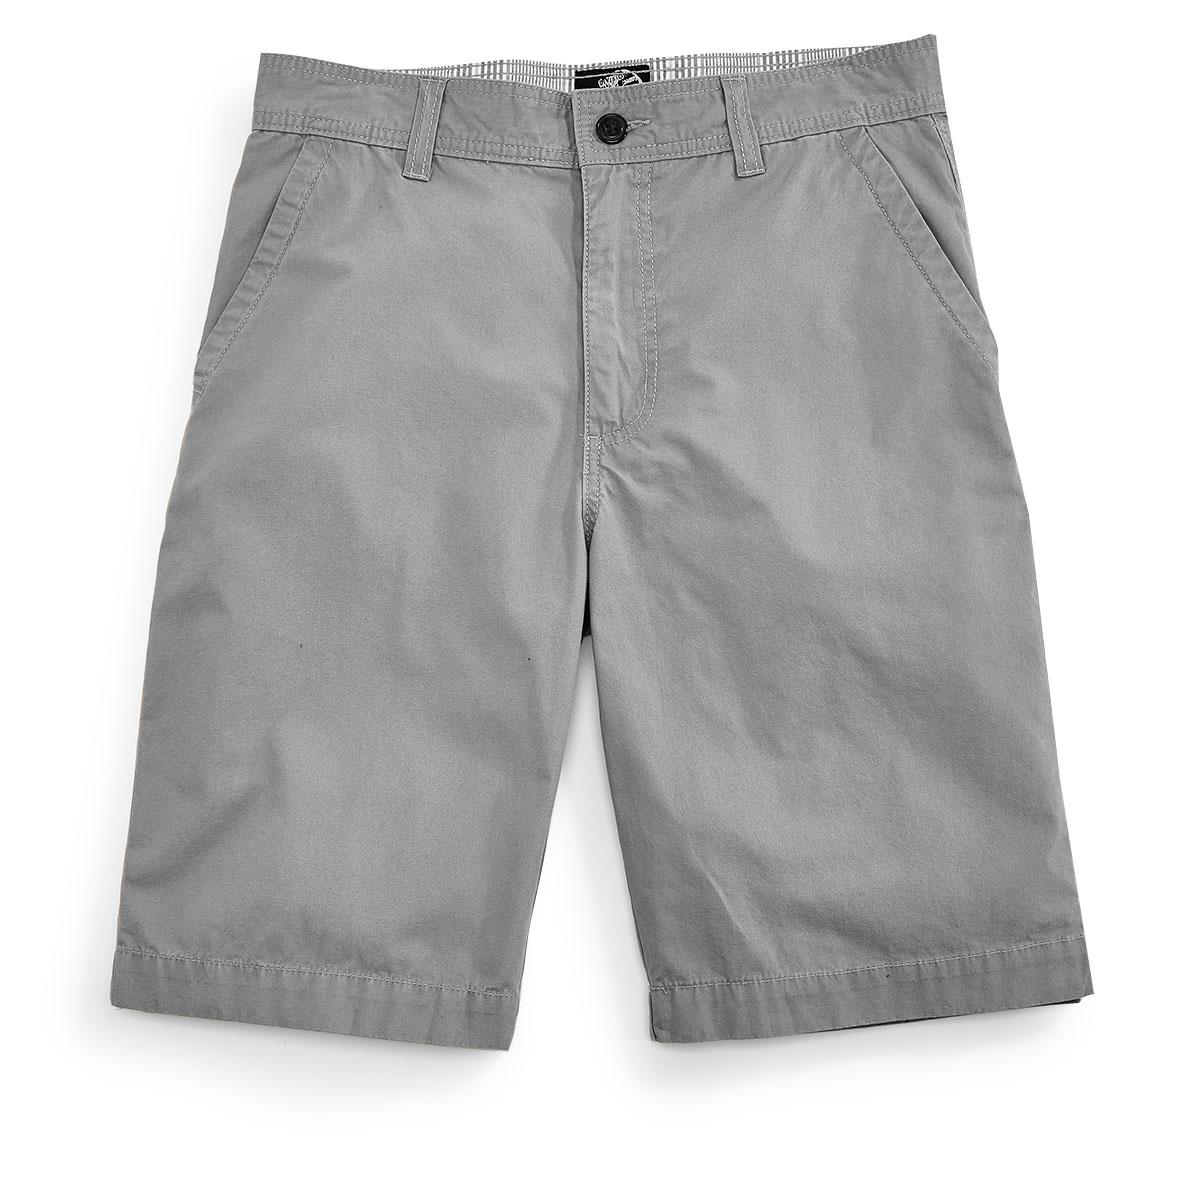 D55 Guys' Flat Front Shorts - Black, 29